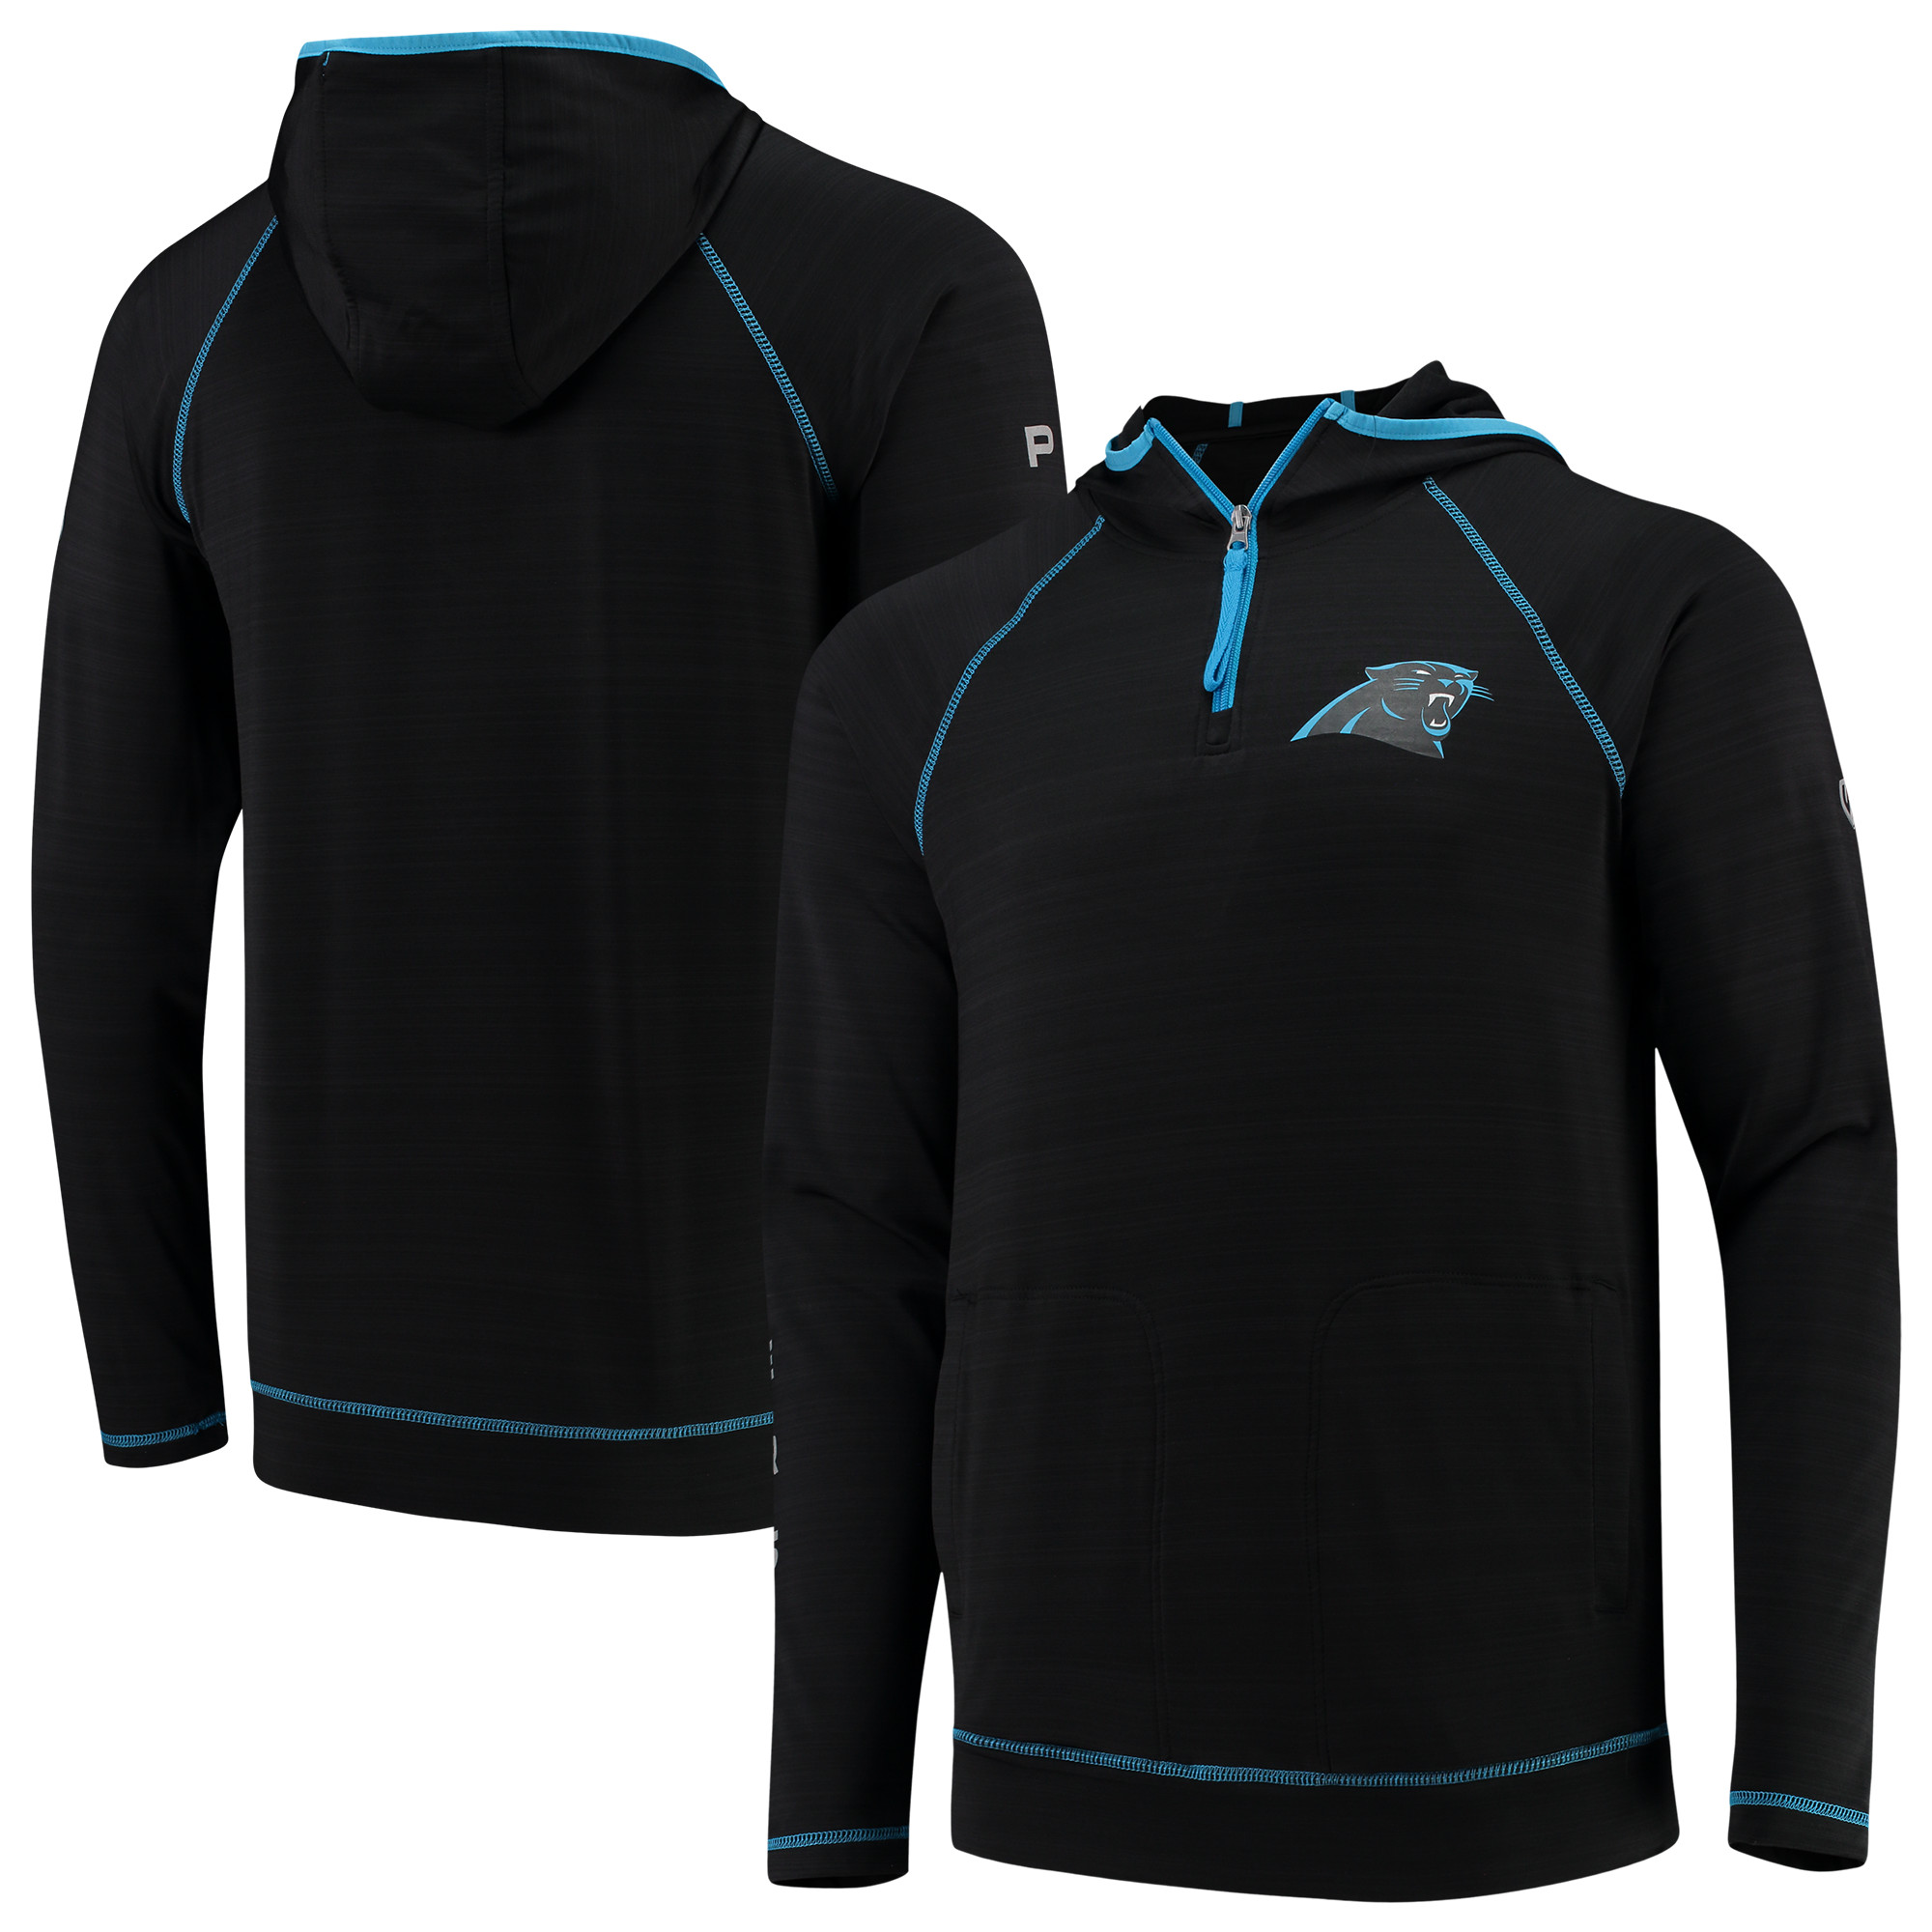 Carolina Panthers Hands High Interval Space Dye Raglan Sleeve Quarter-Zip Pullover Hoodie - Black - XL